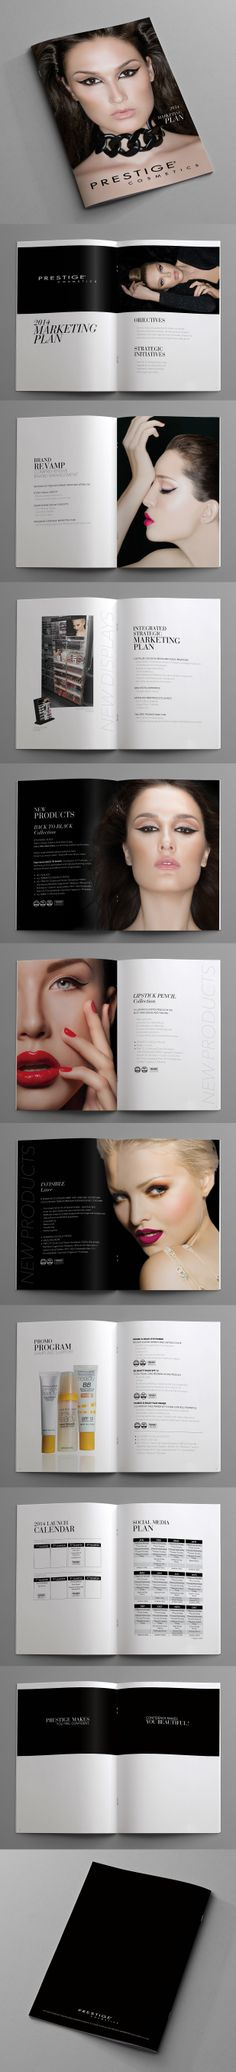 Marketing Plan (Magazine) / Prestige Cosmetics